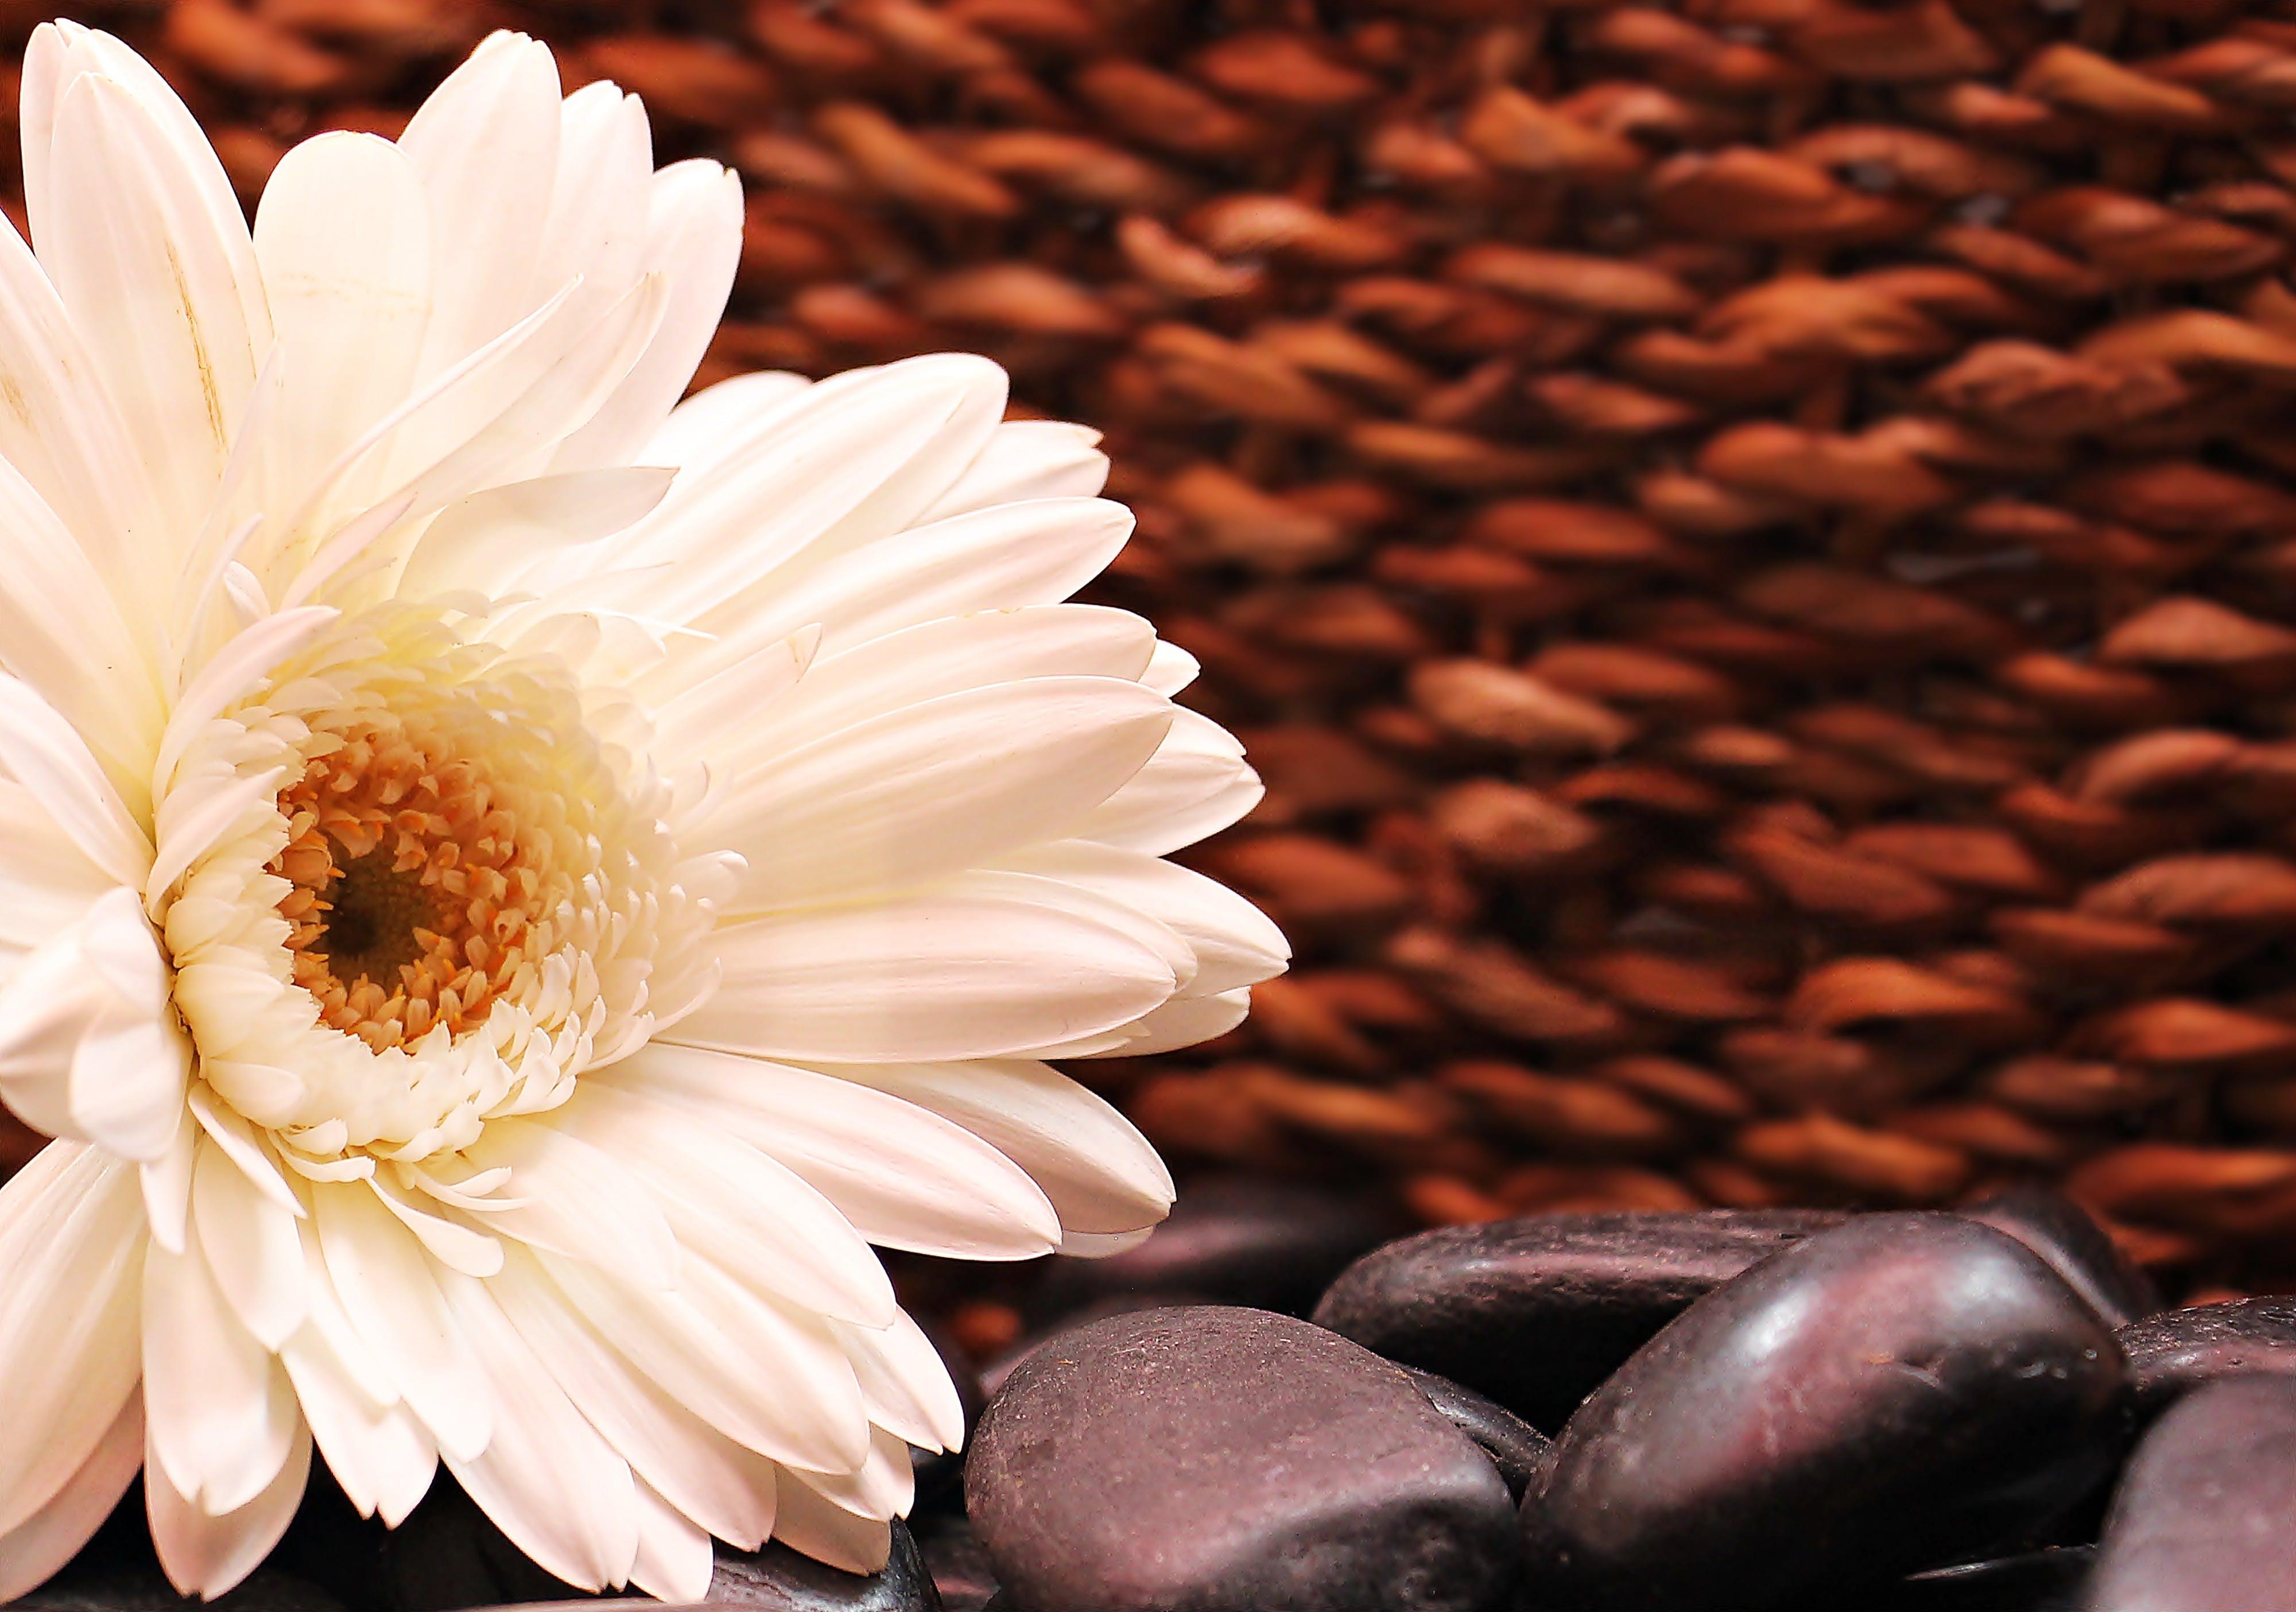 White Gerbera Daisy Flower in Bloom on Black Pebbles